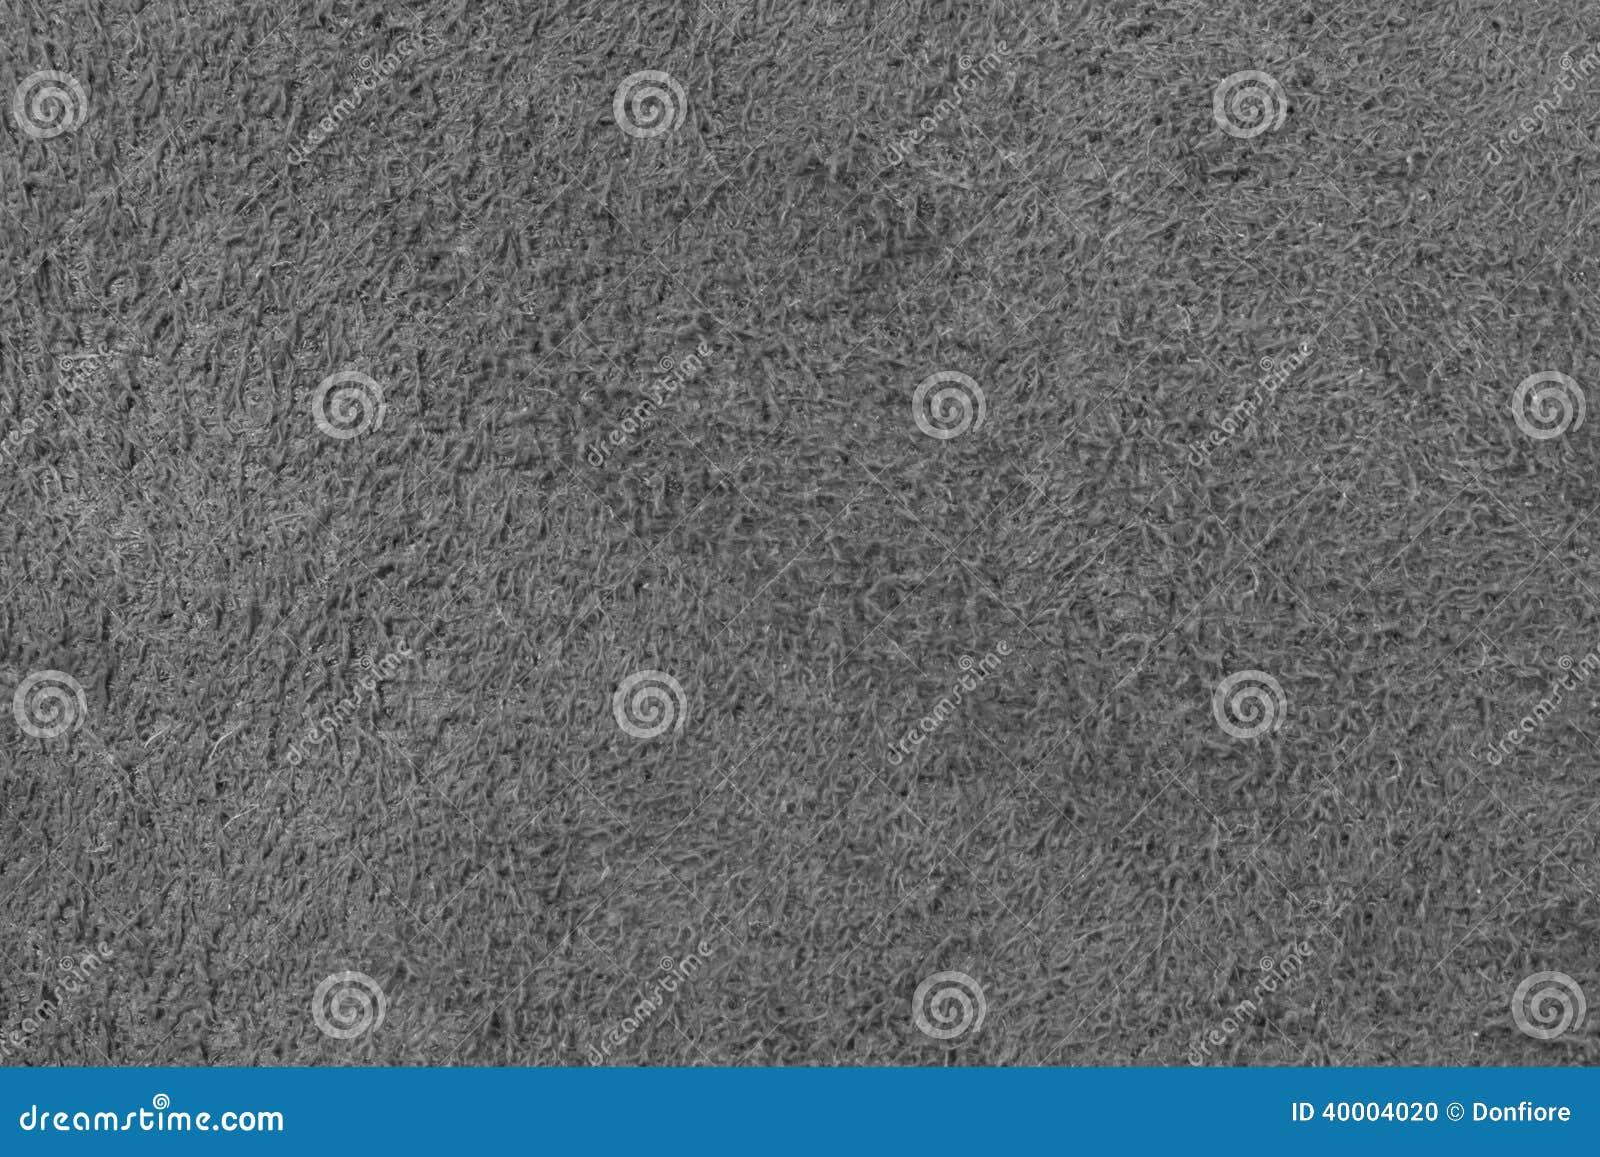 Fabric Texture, Seamless Grey Carpet Or Moquette Stock Photo ... for Grey Fabric Texture Seamless  143gtk